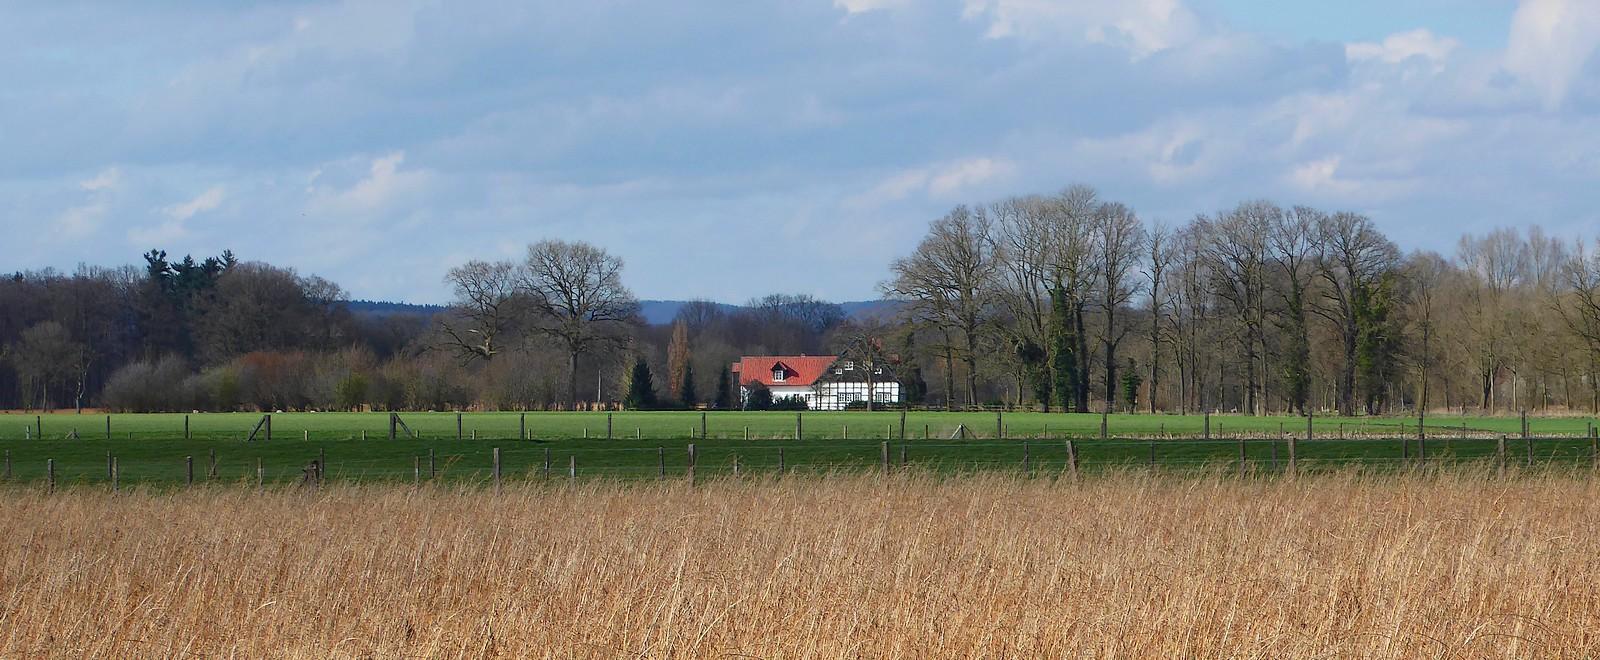 Westfälische Landschaft im Winter.